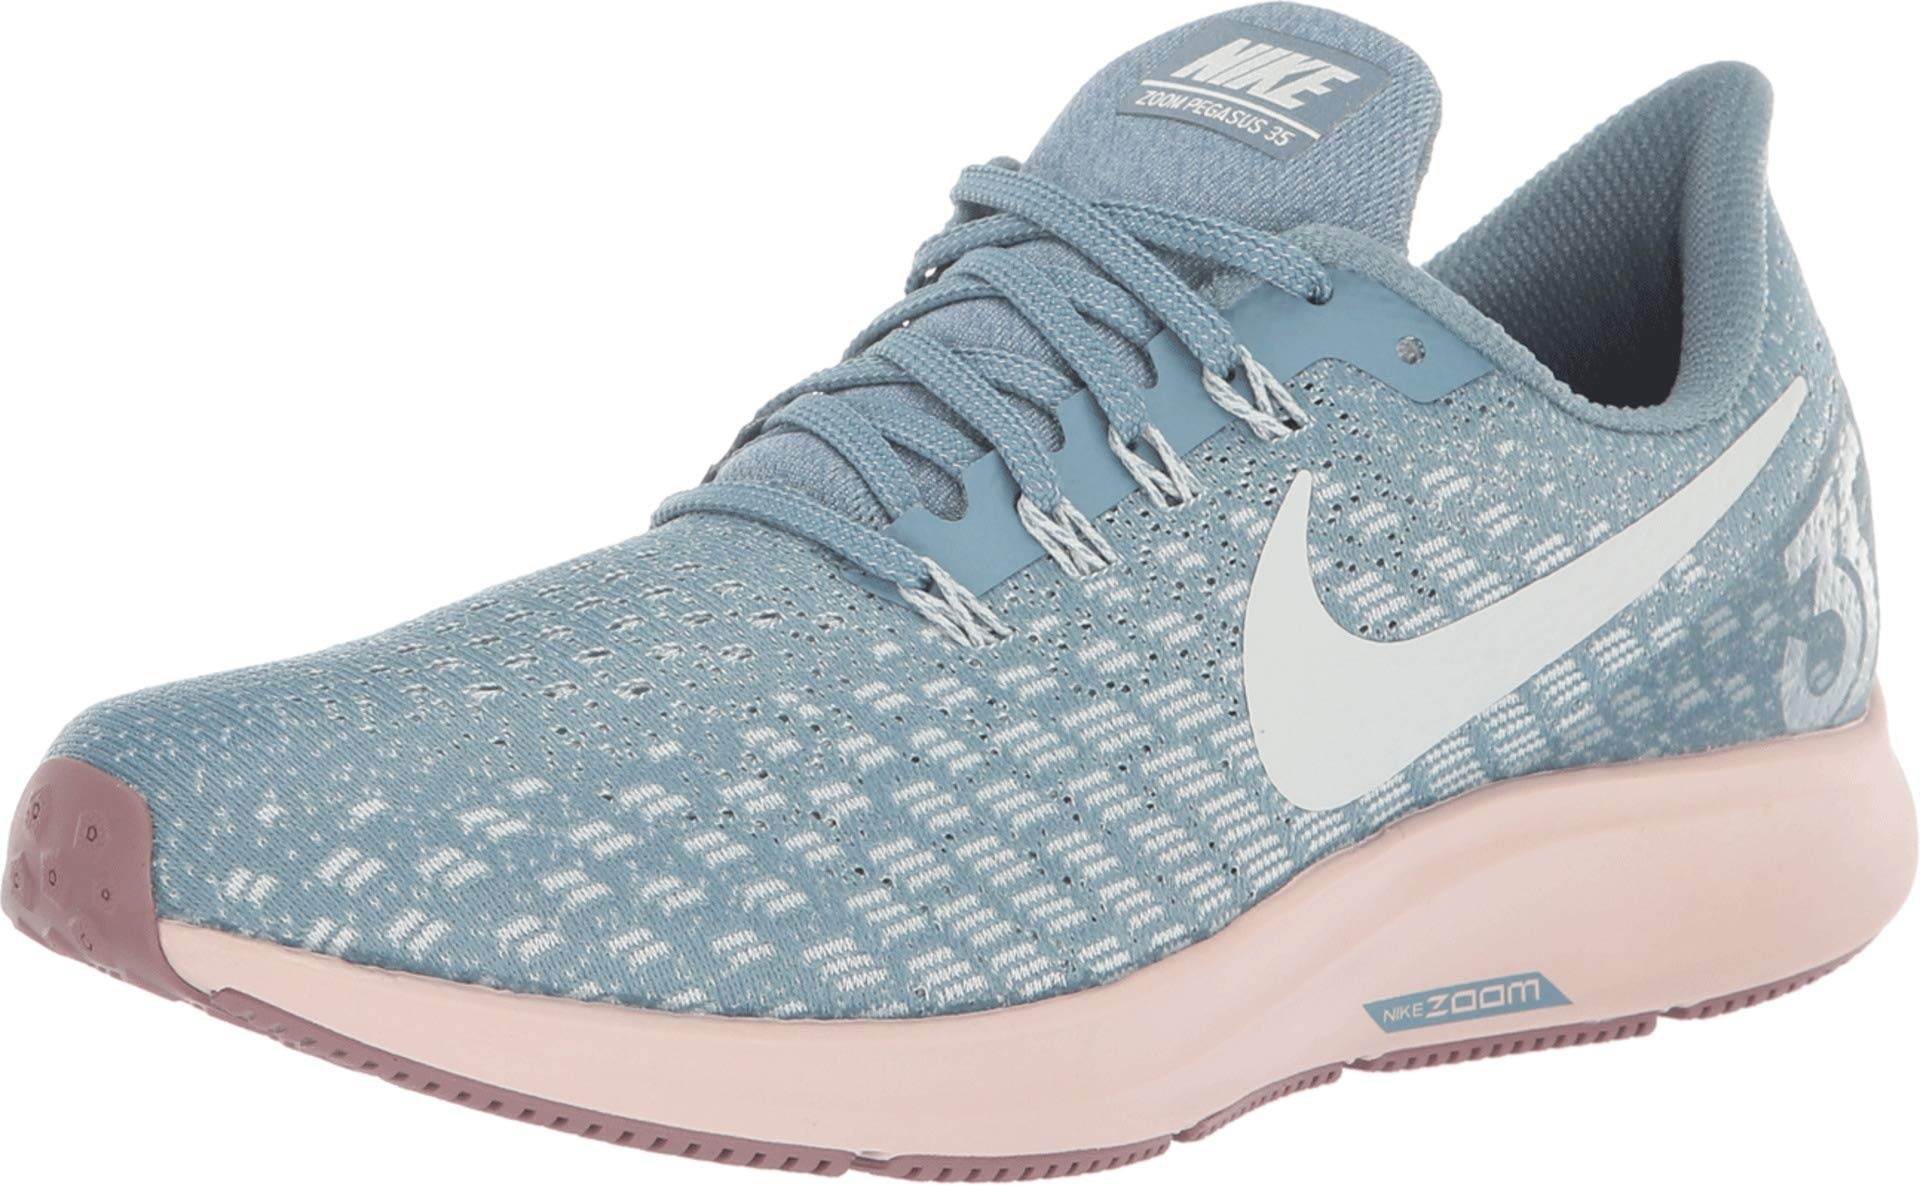 9e3be850d04ea Galleon - Nike Women s Air Zoom Pegasus 35 Celestial Teal Light Silver 11.0